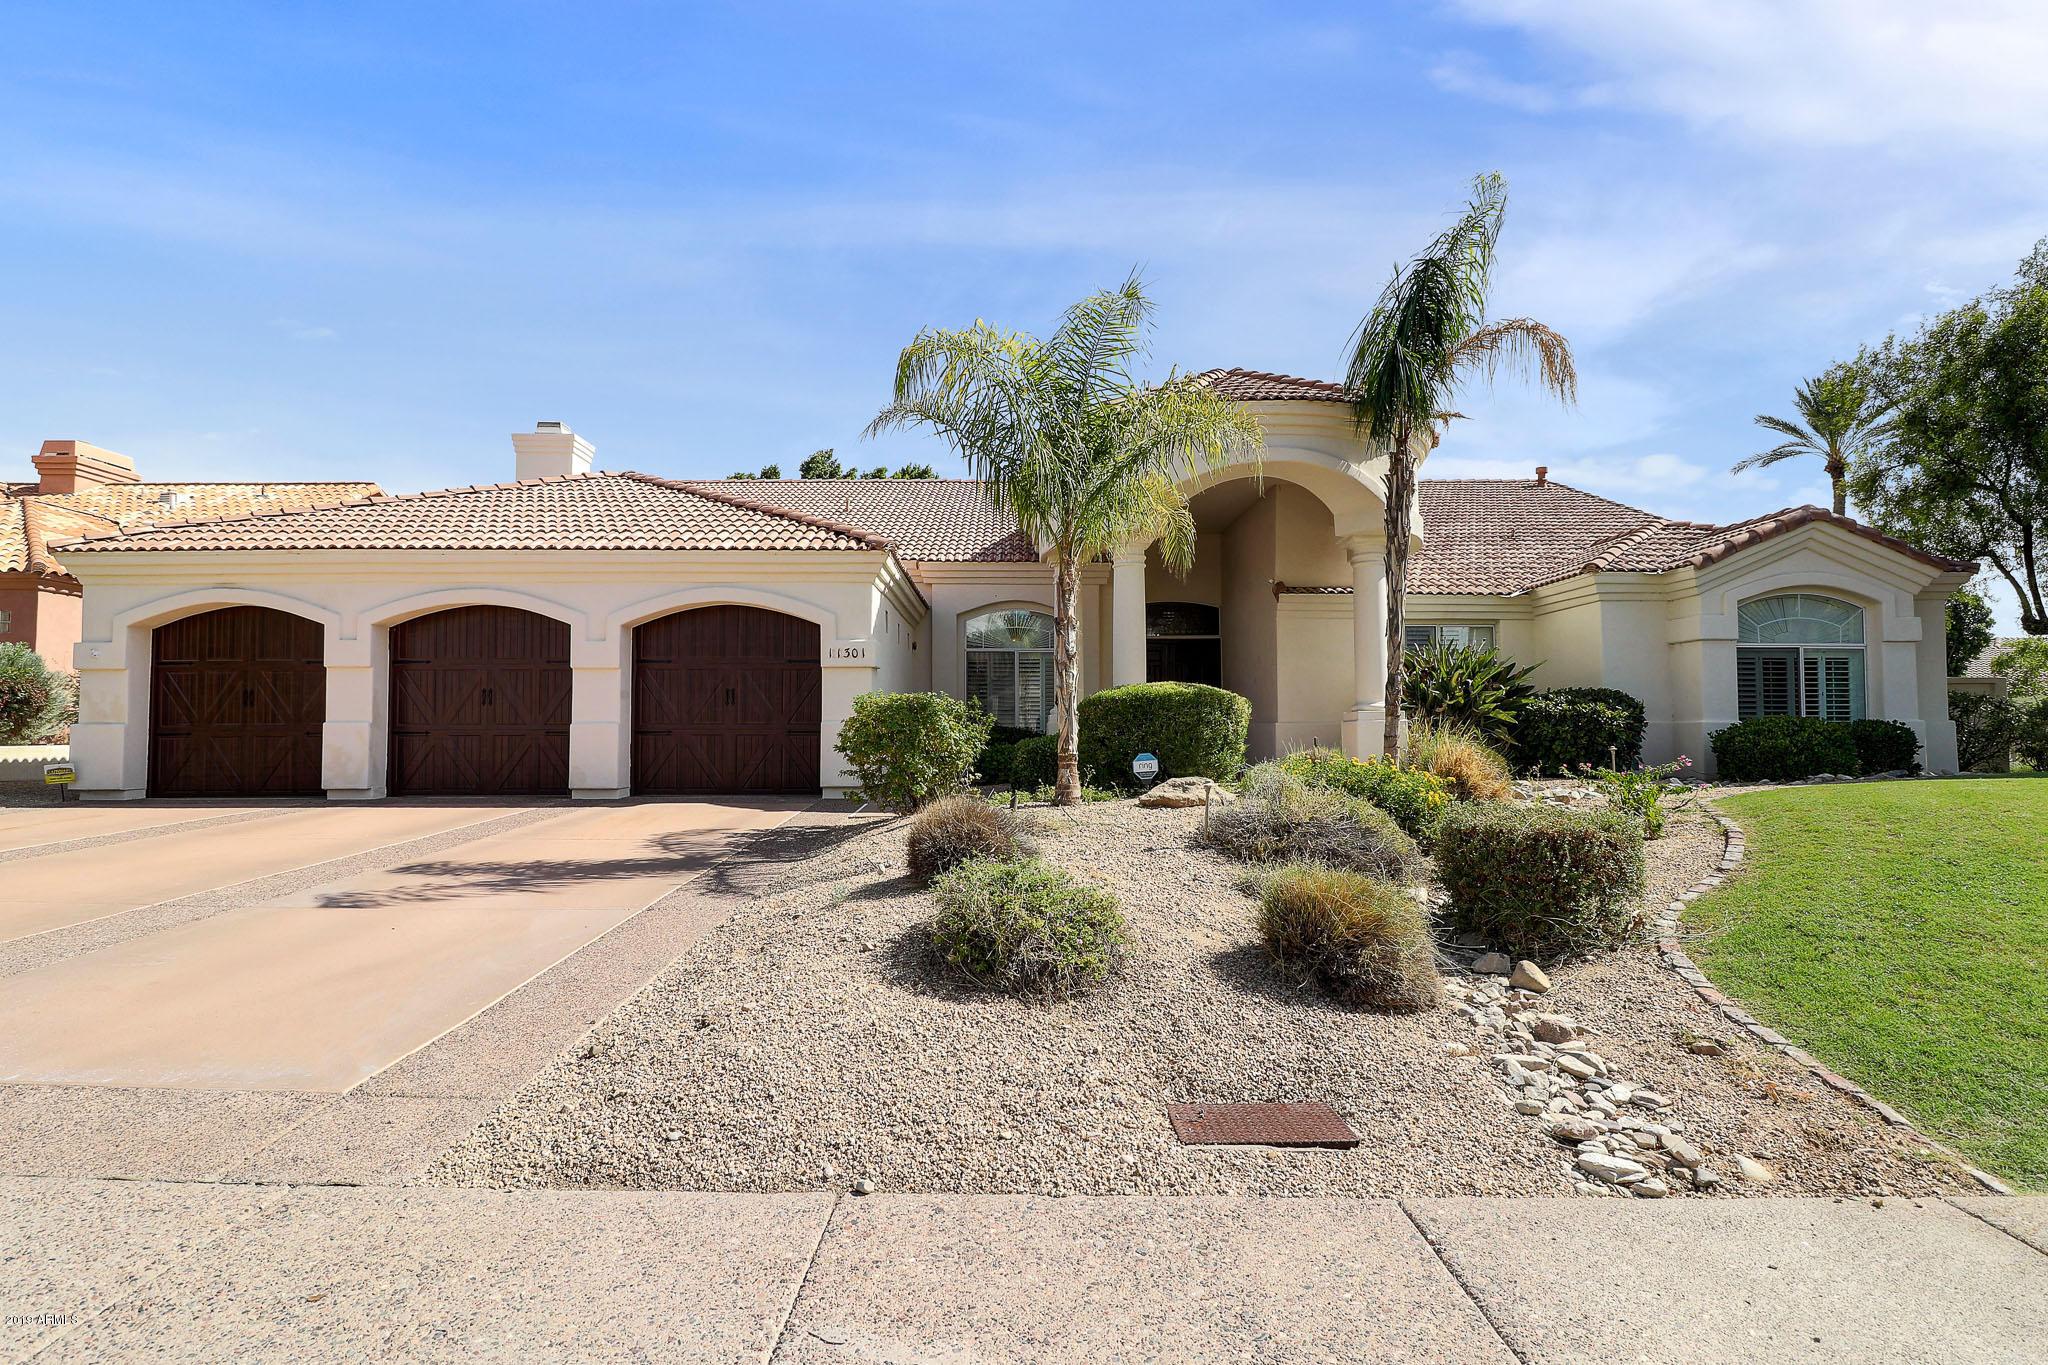 MLS 5962447 11301 E APPALOOSA Place, Scottsdale, AZ 85259 Scottsdale AZ Private Pool